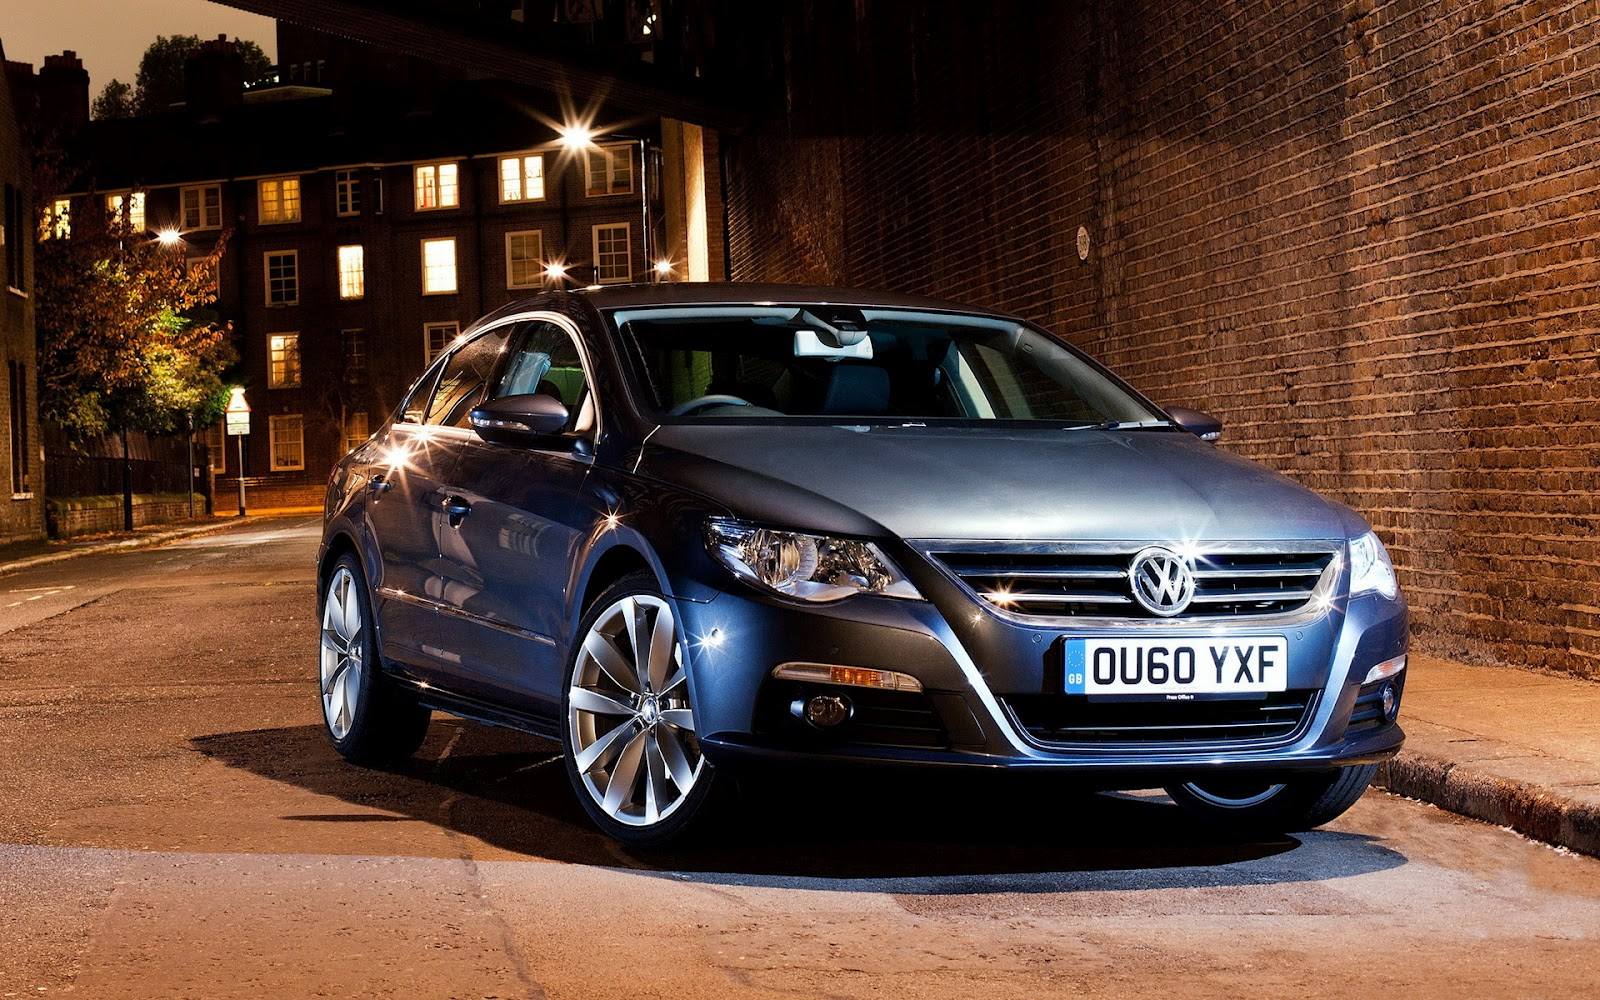 Wallpapers Of Beautiful Cars: Volkswagen CC (aka